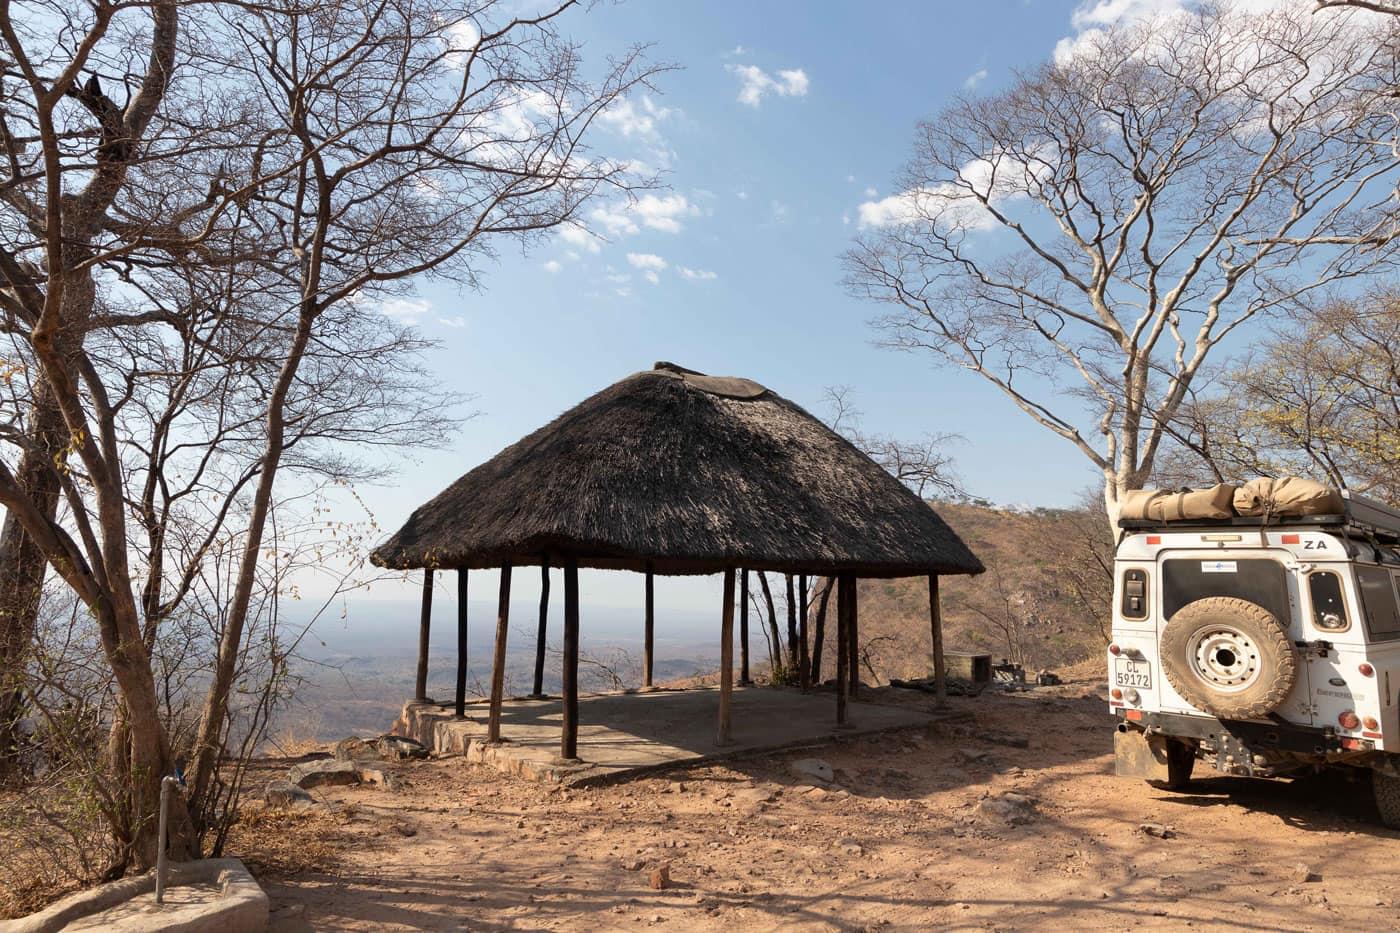 Johann Groenewald - Chizarira National Park - Mucheni View Campsite